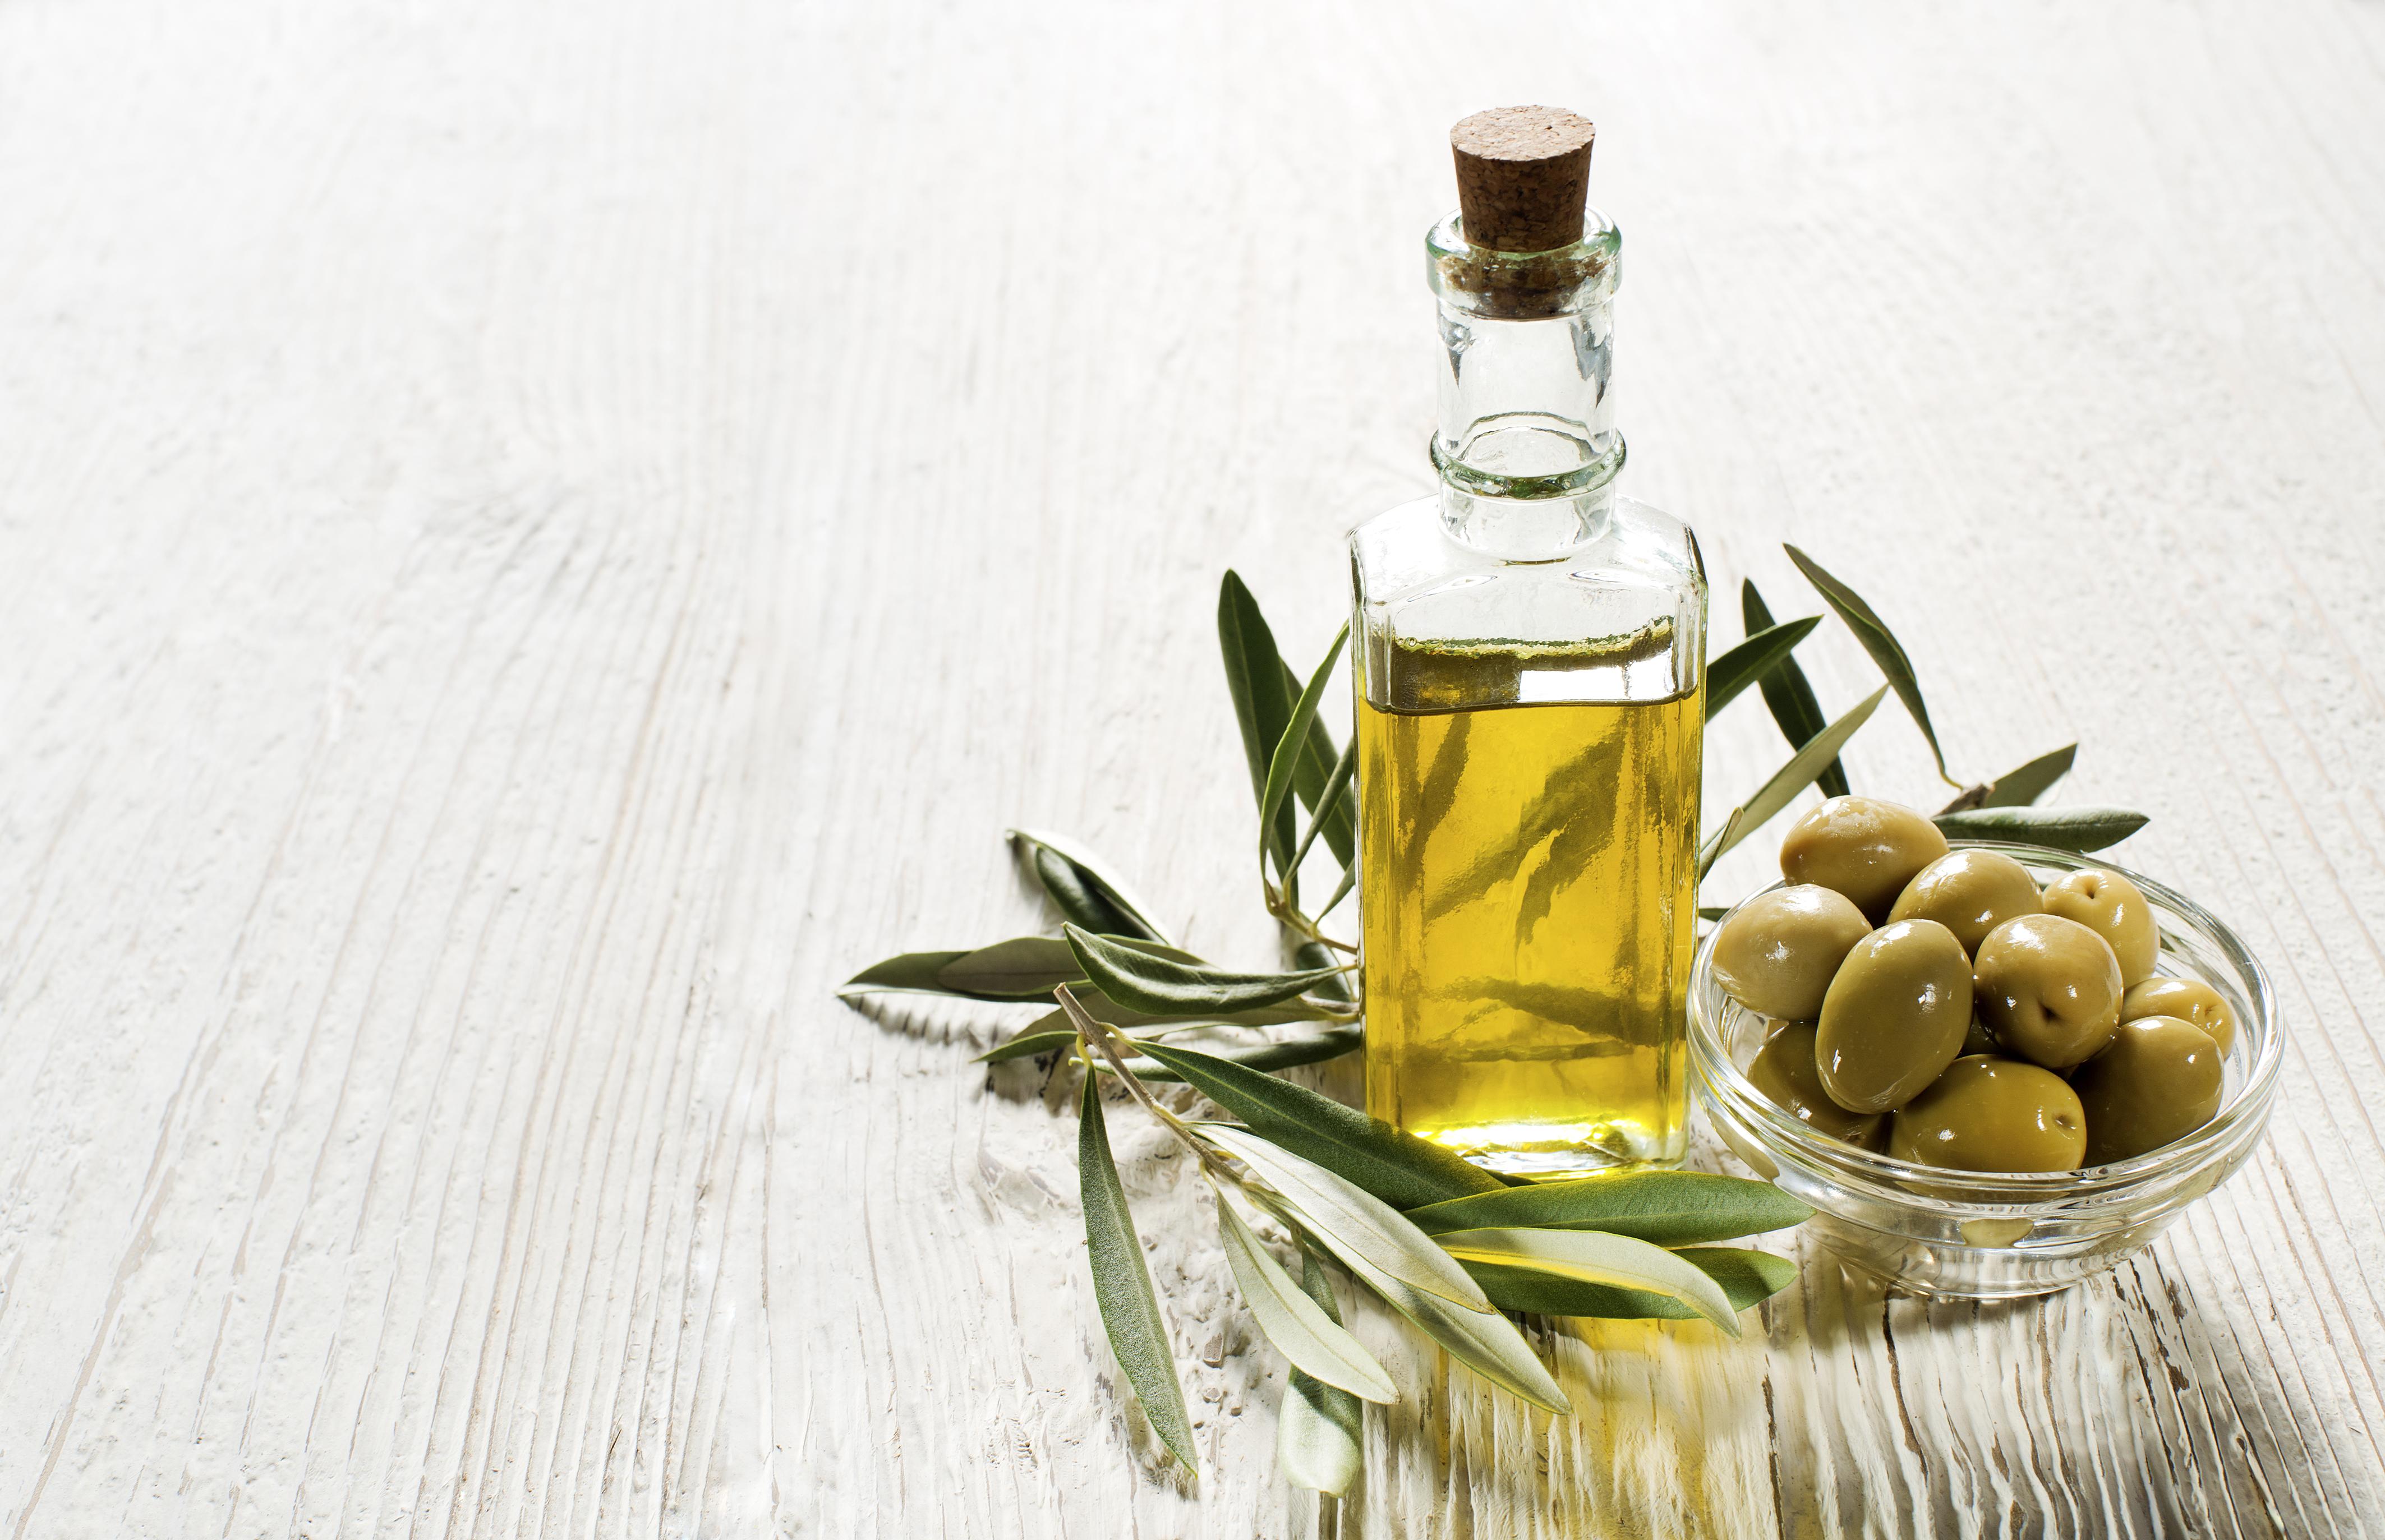 Leinöl kaltgepresst Bio Olivenöl